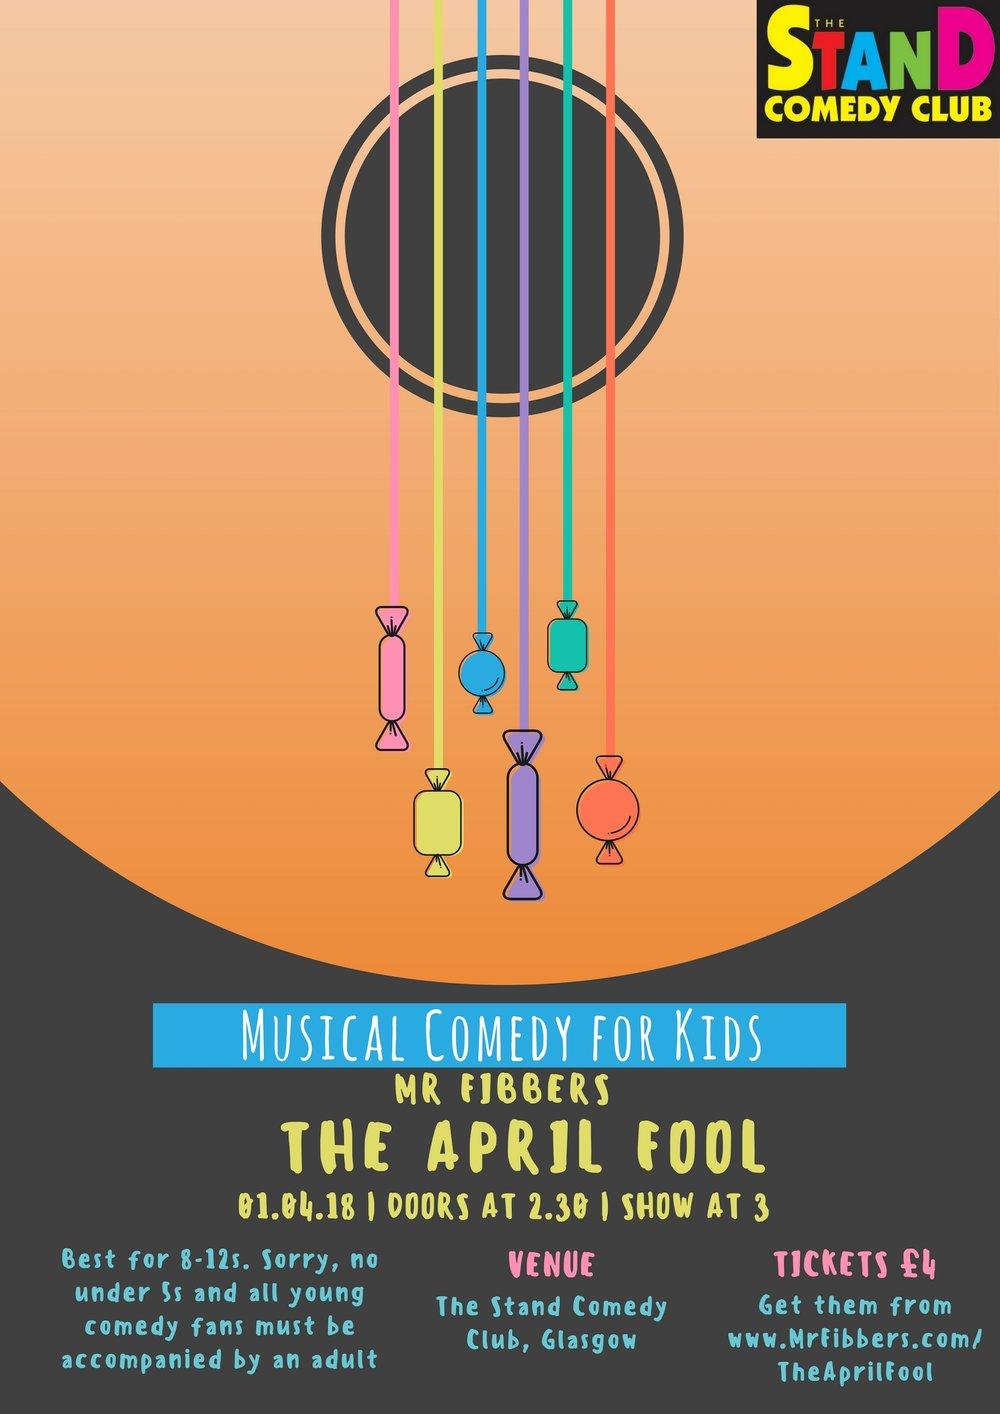 An April Fool Special - great fun!